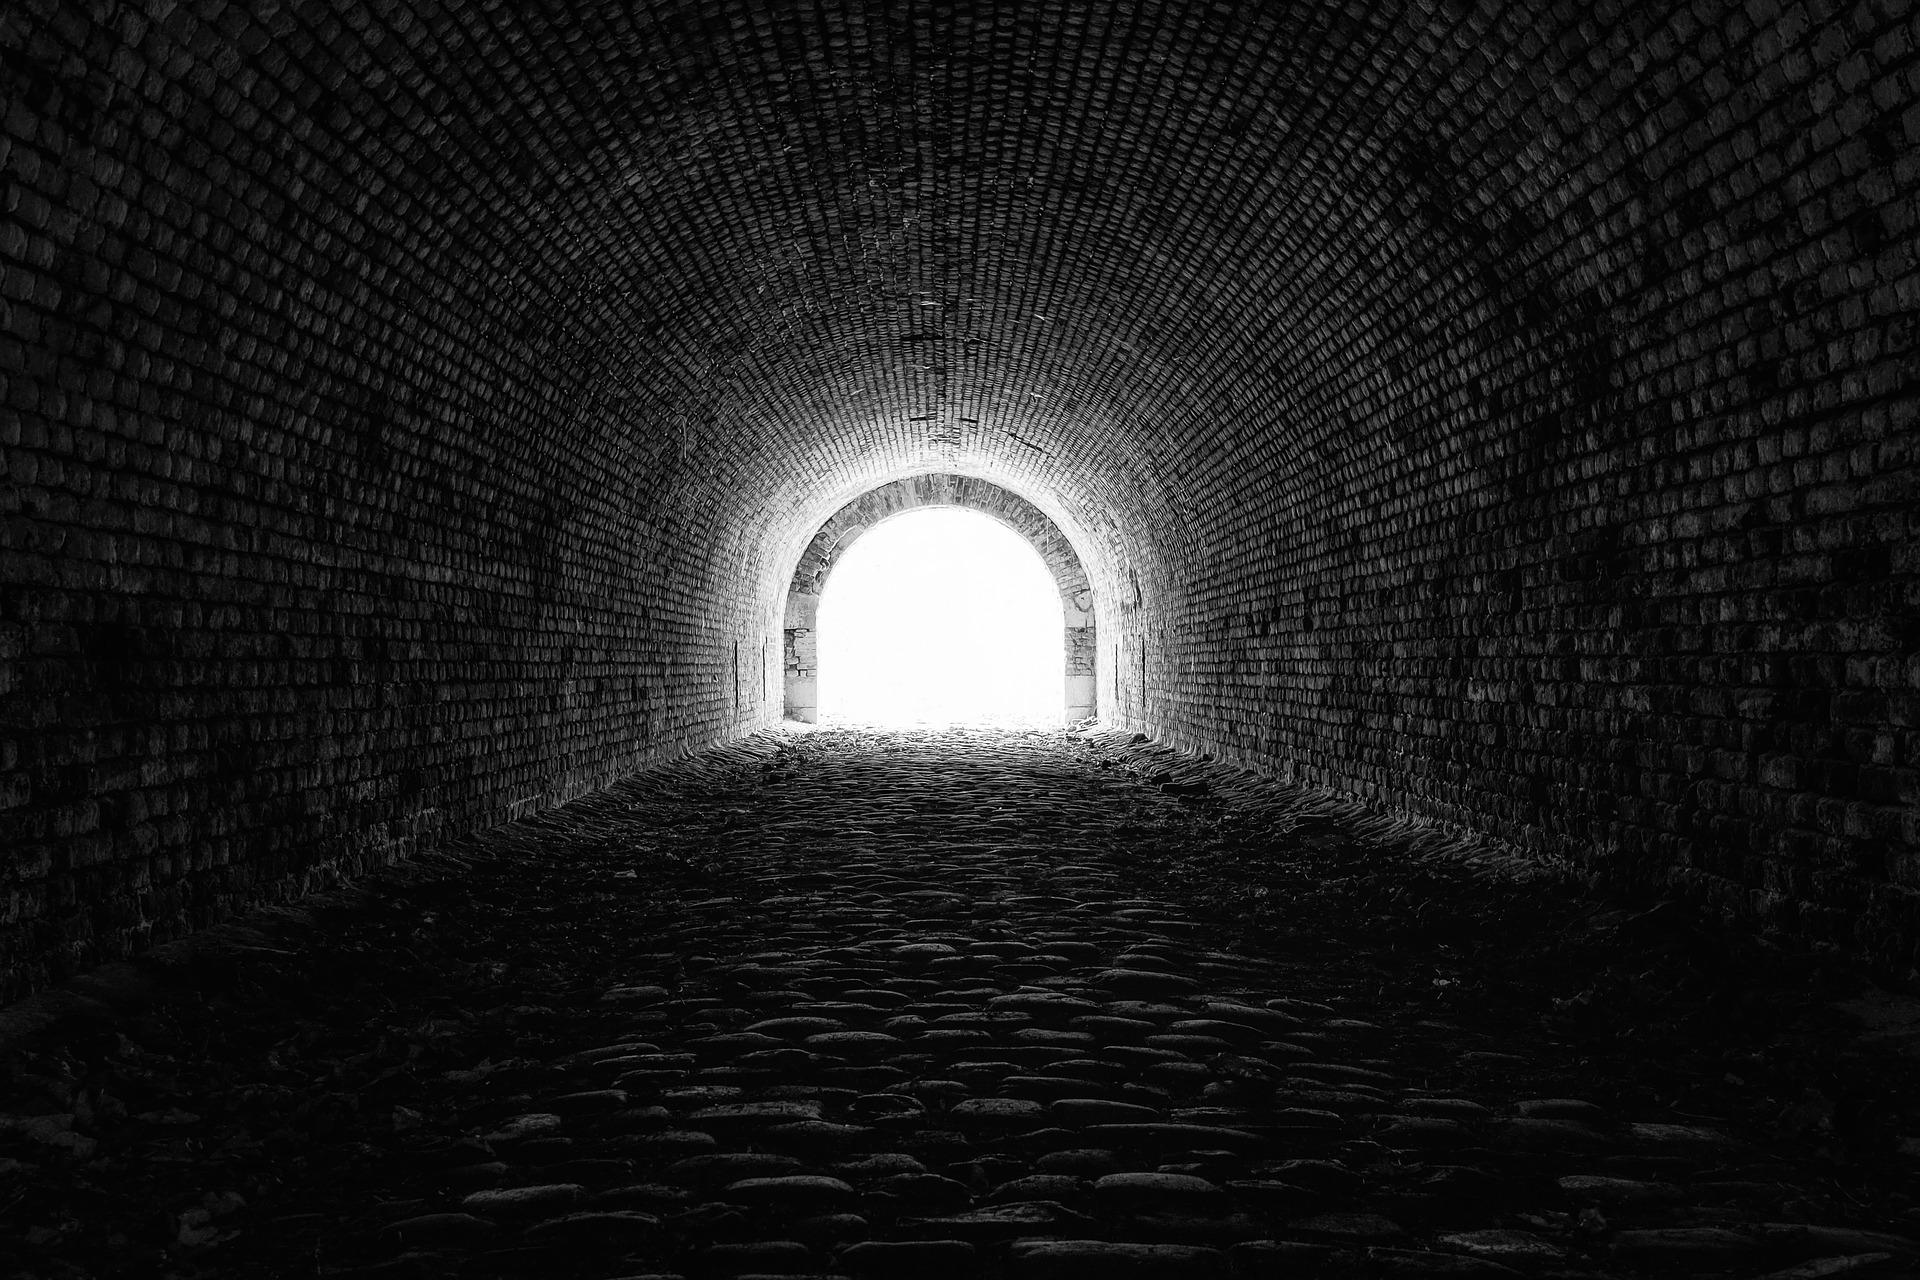 Ein Licht am Ende des Tunnels - světlo na konci tunelu (Foto: Tama66, Pixabay / CC0)